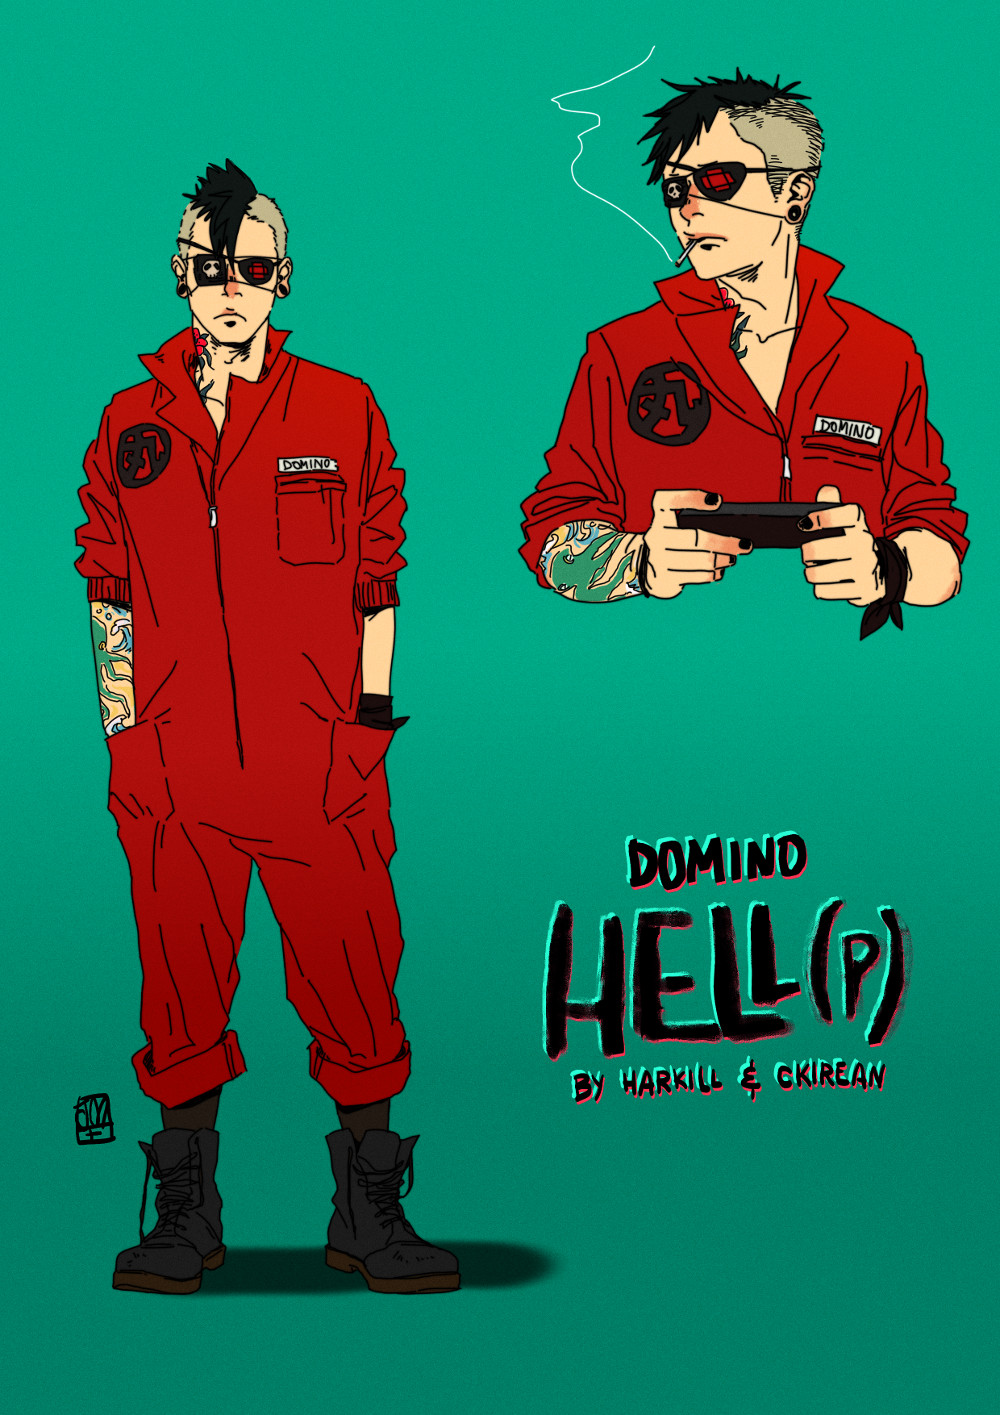 Domino by jessica mars by Harkill